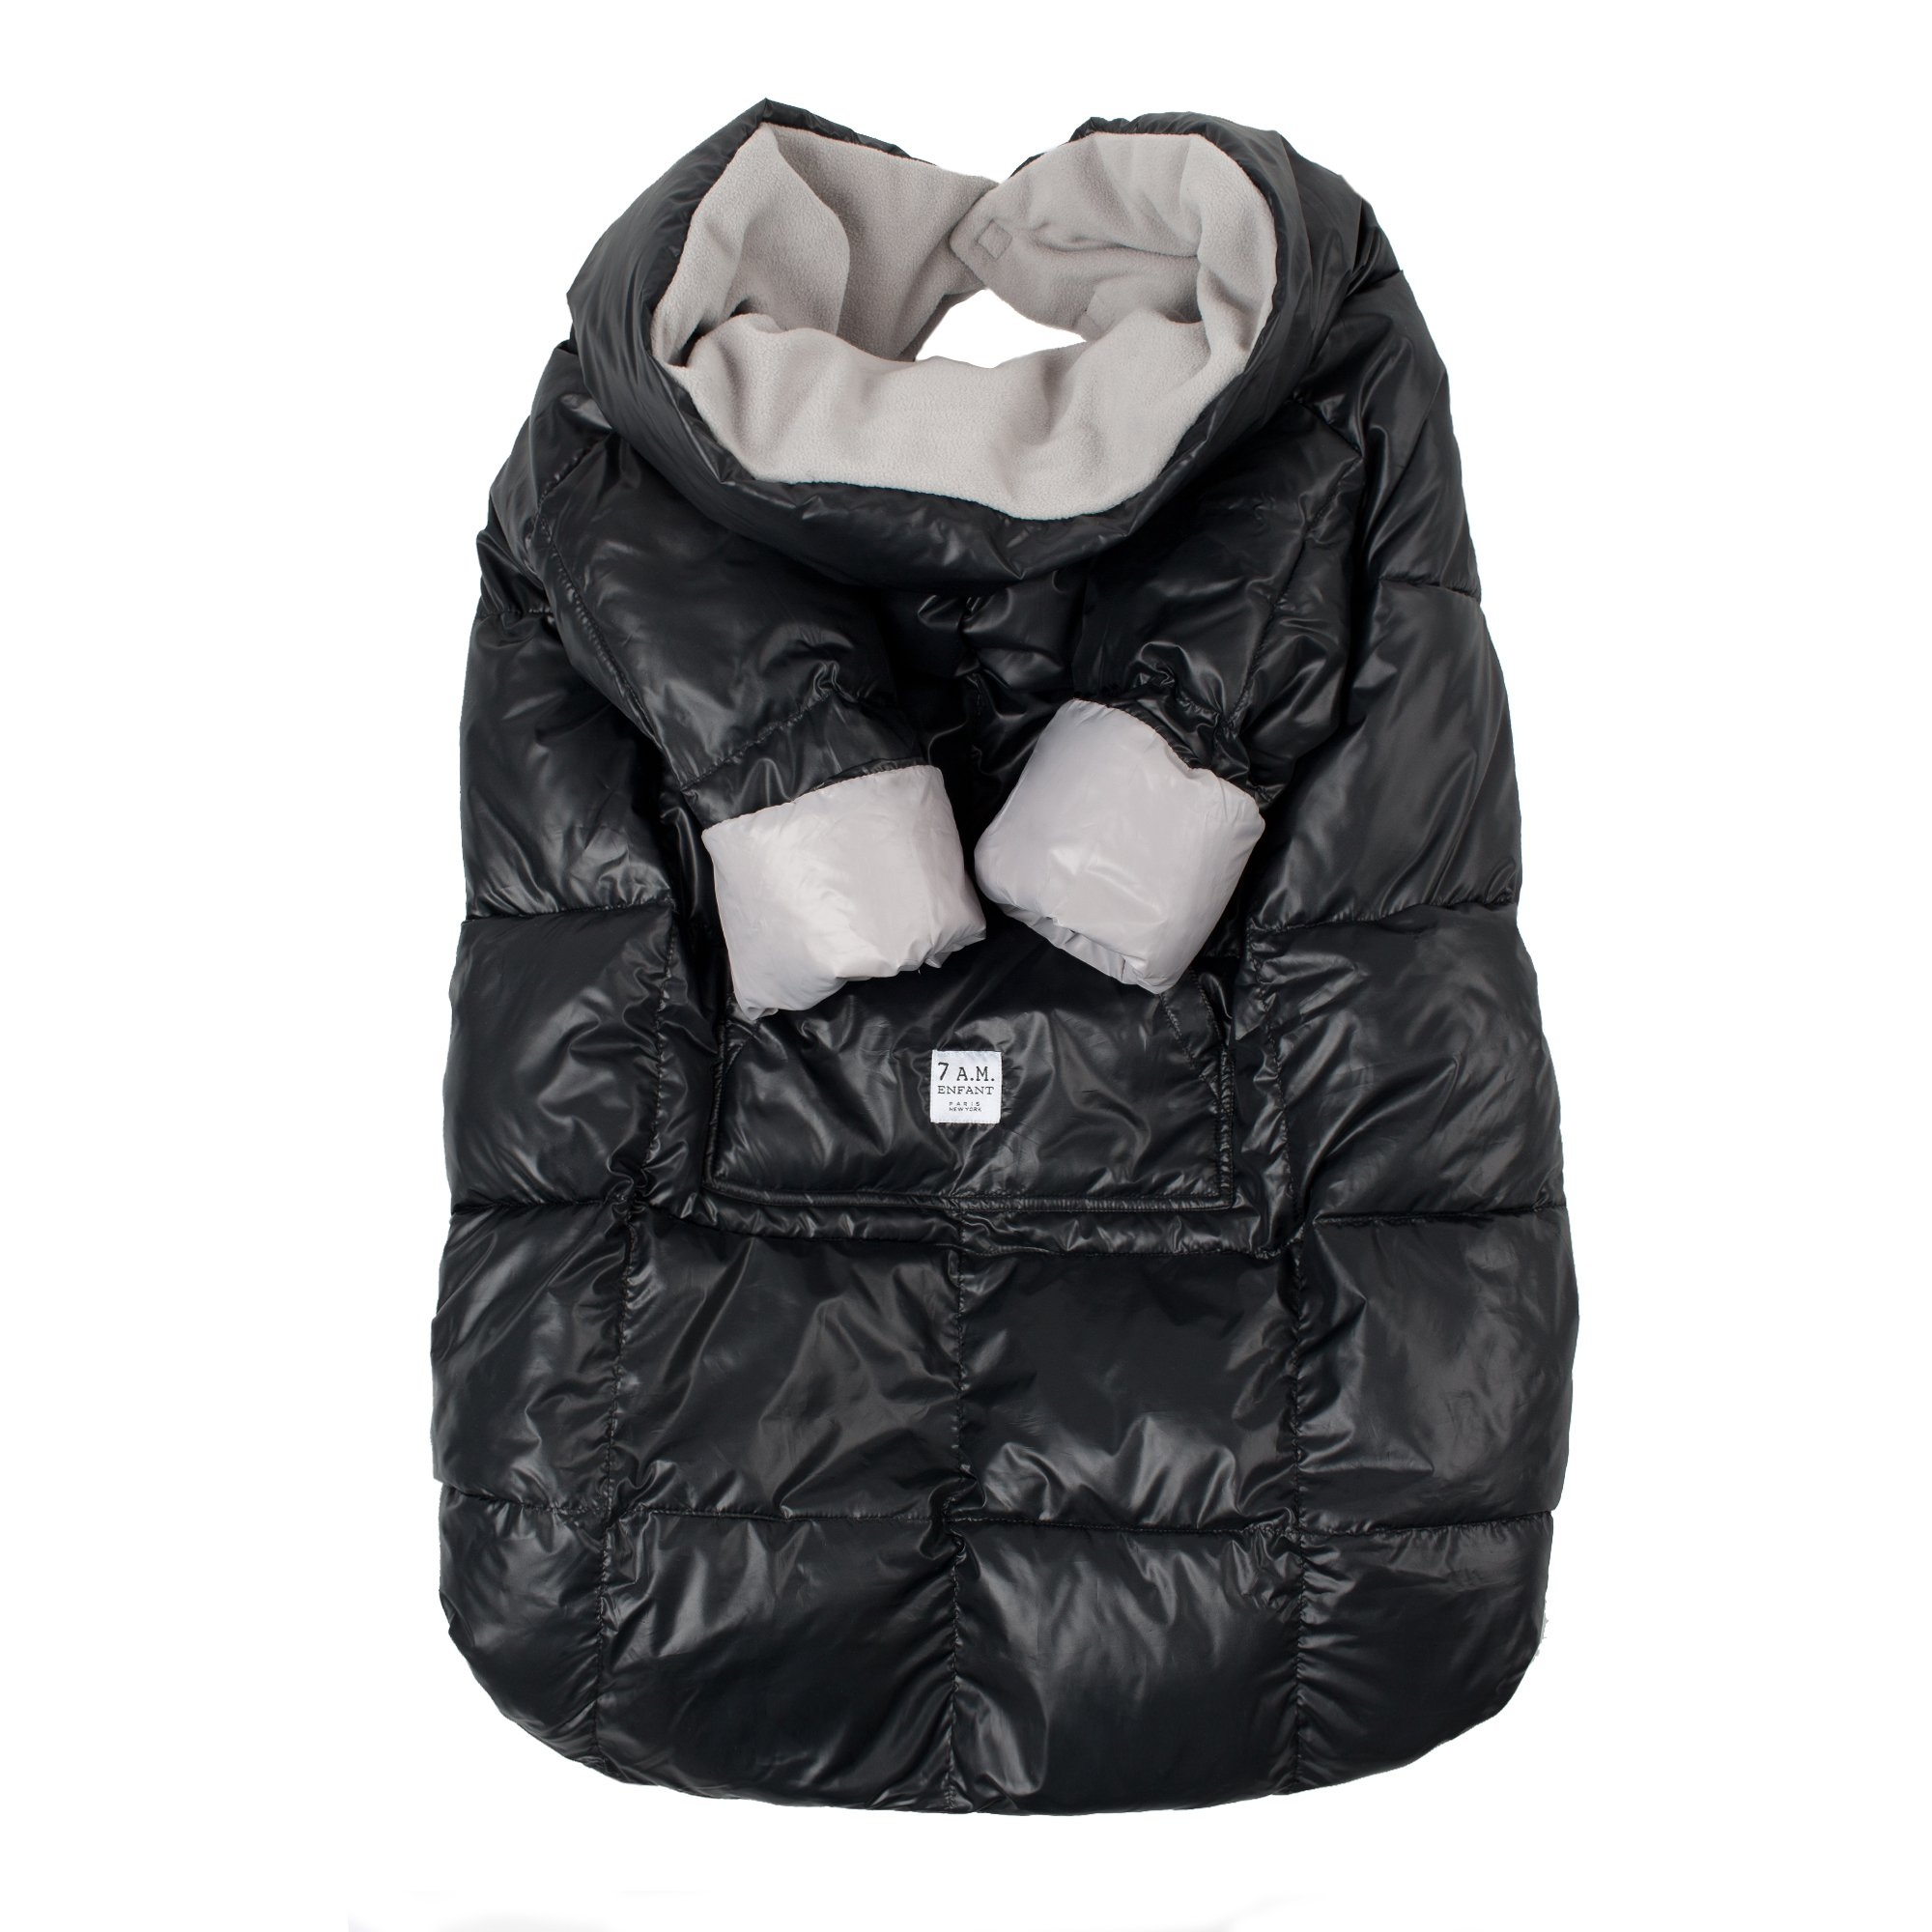 7AM Enfant Easy Cover Bunting Bag, Black, Small